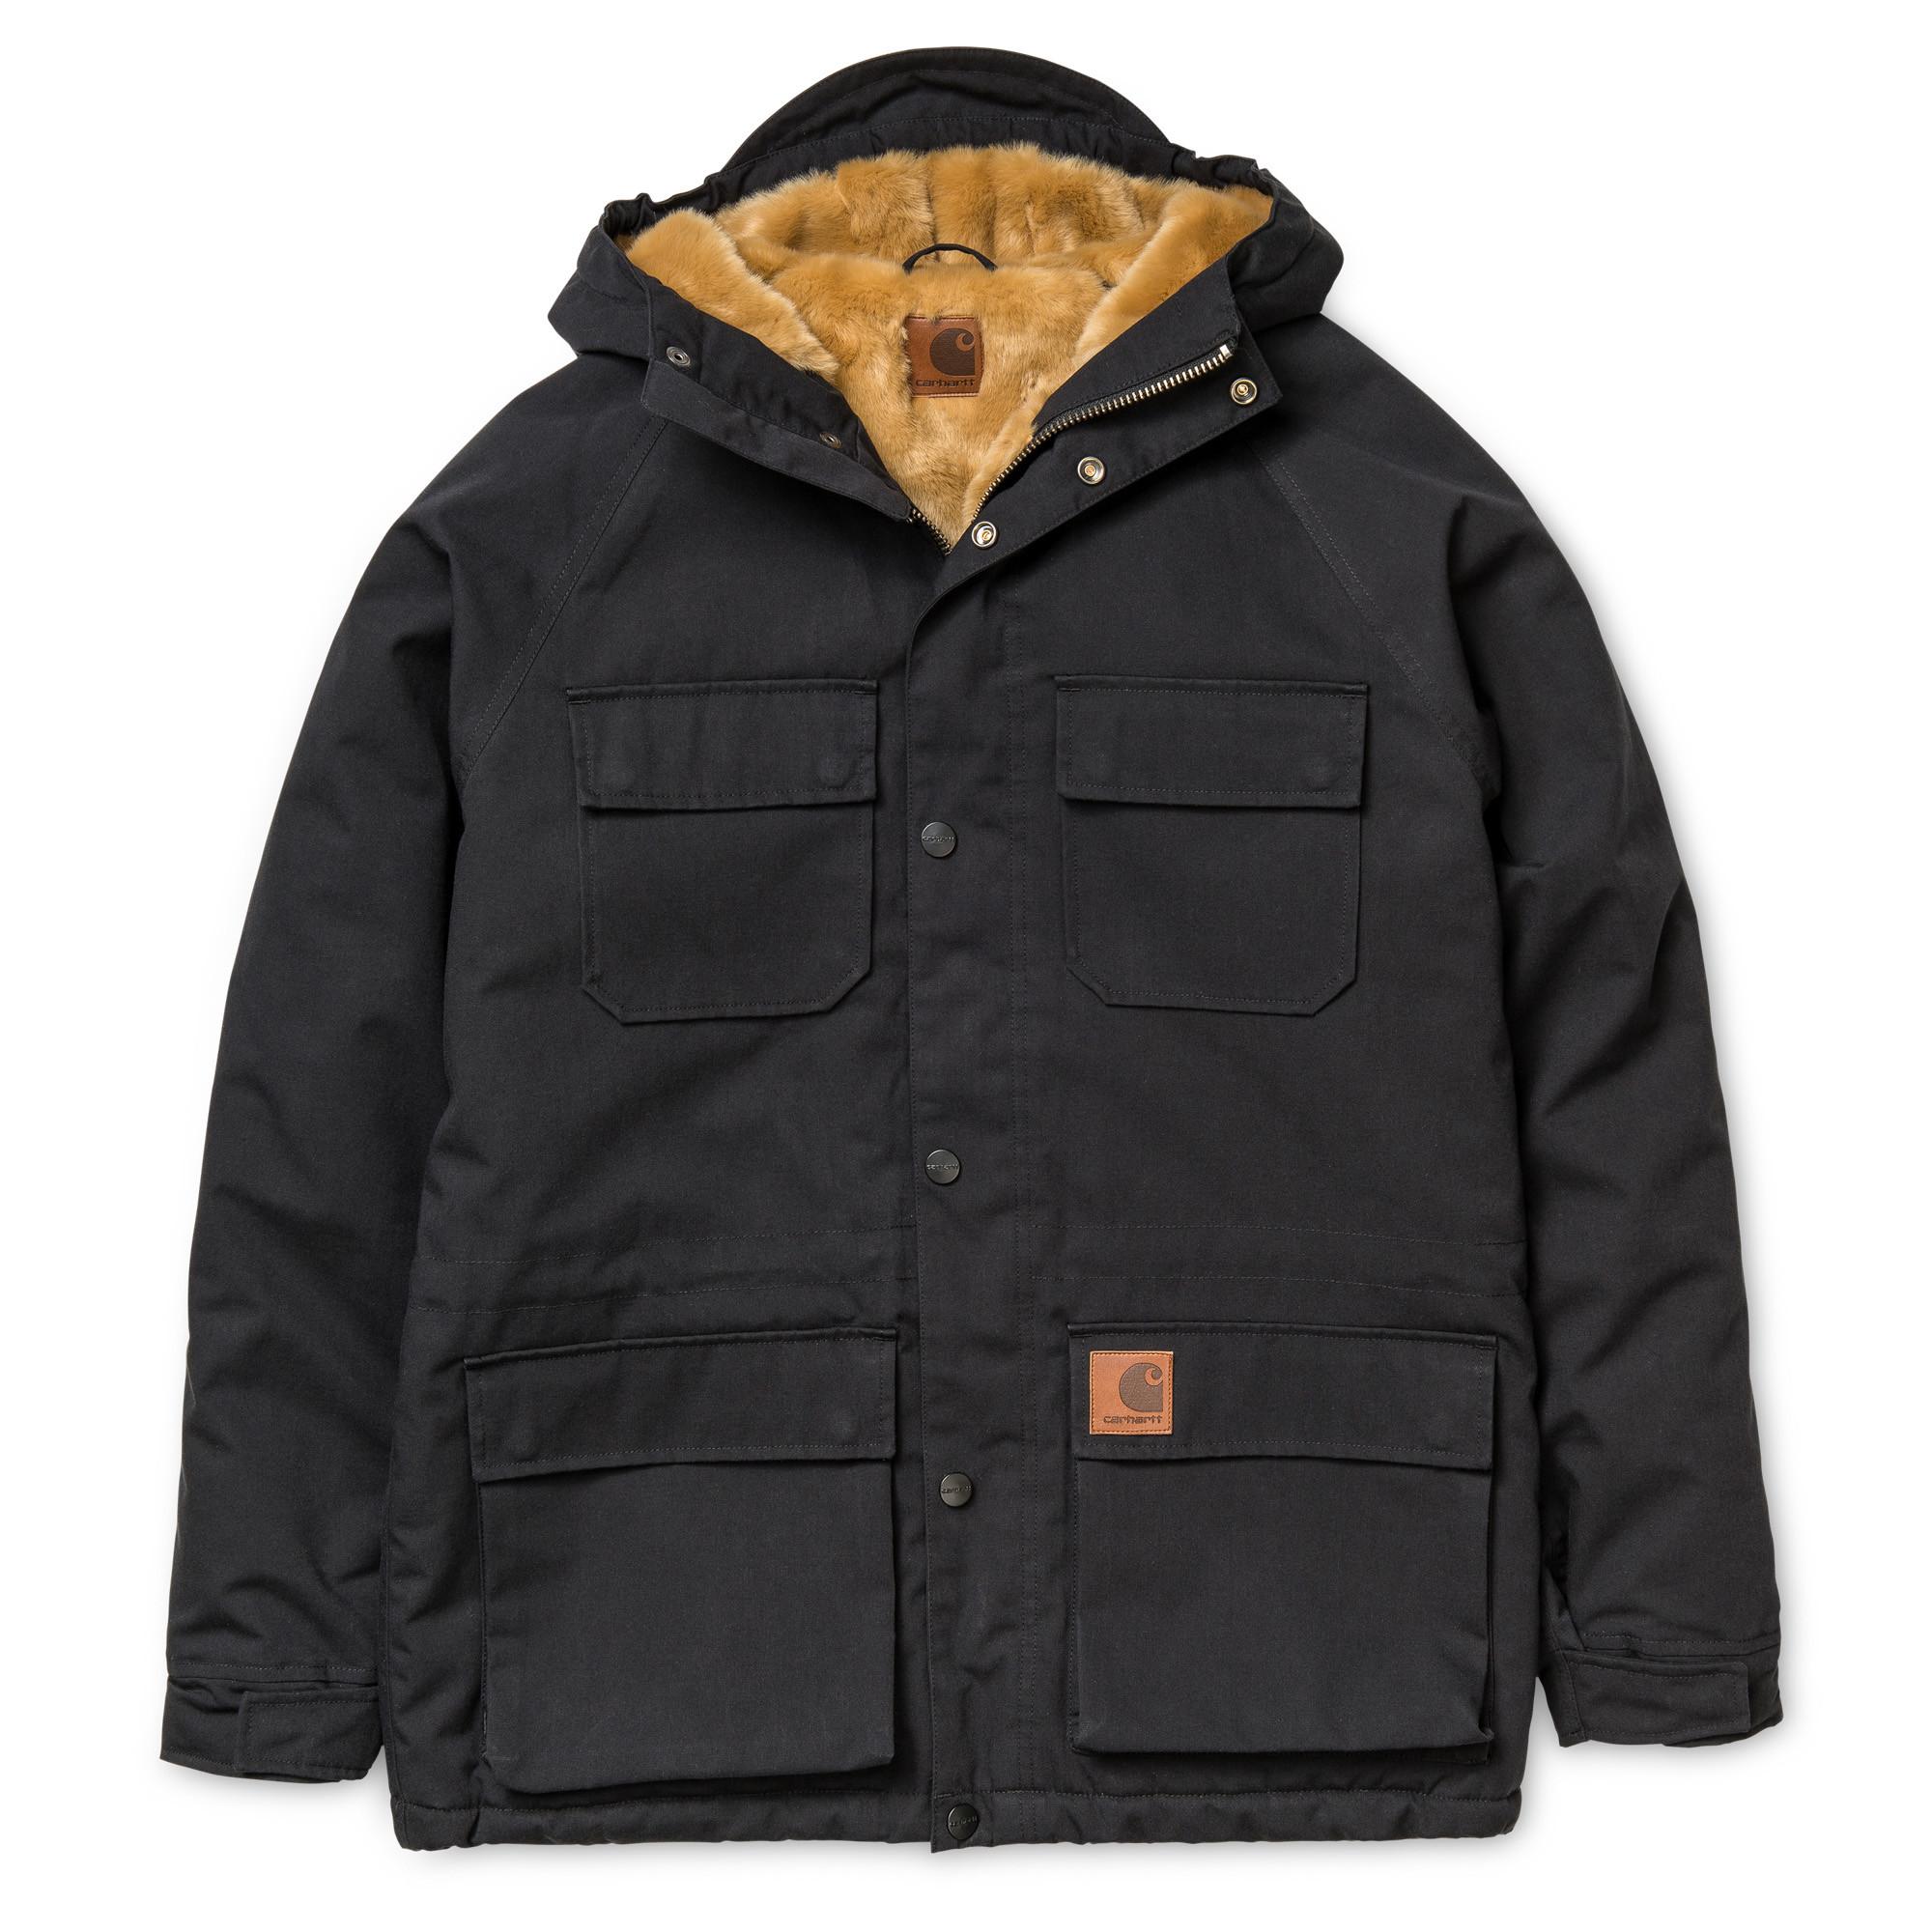 Kurtka Zimowa Carhartt Mentley Jacket Black